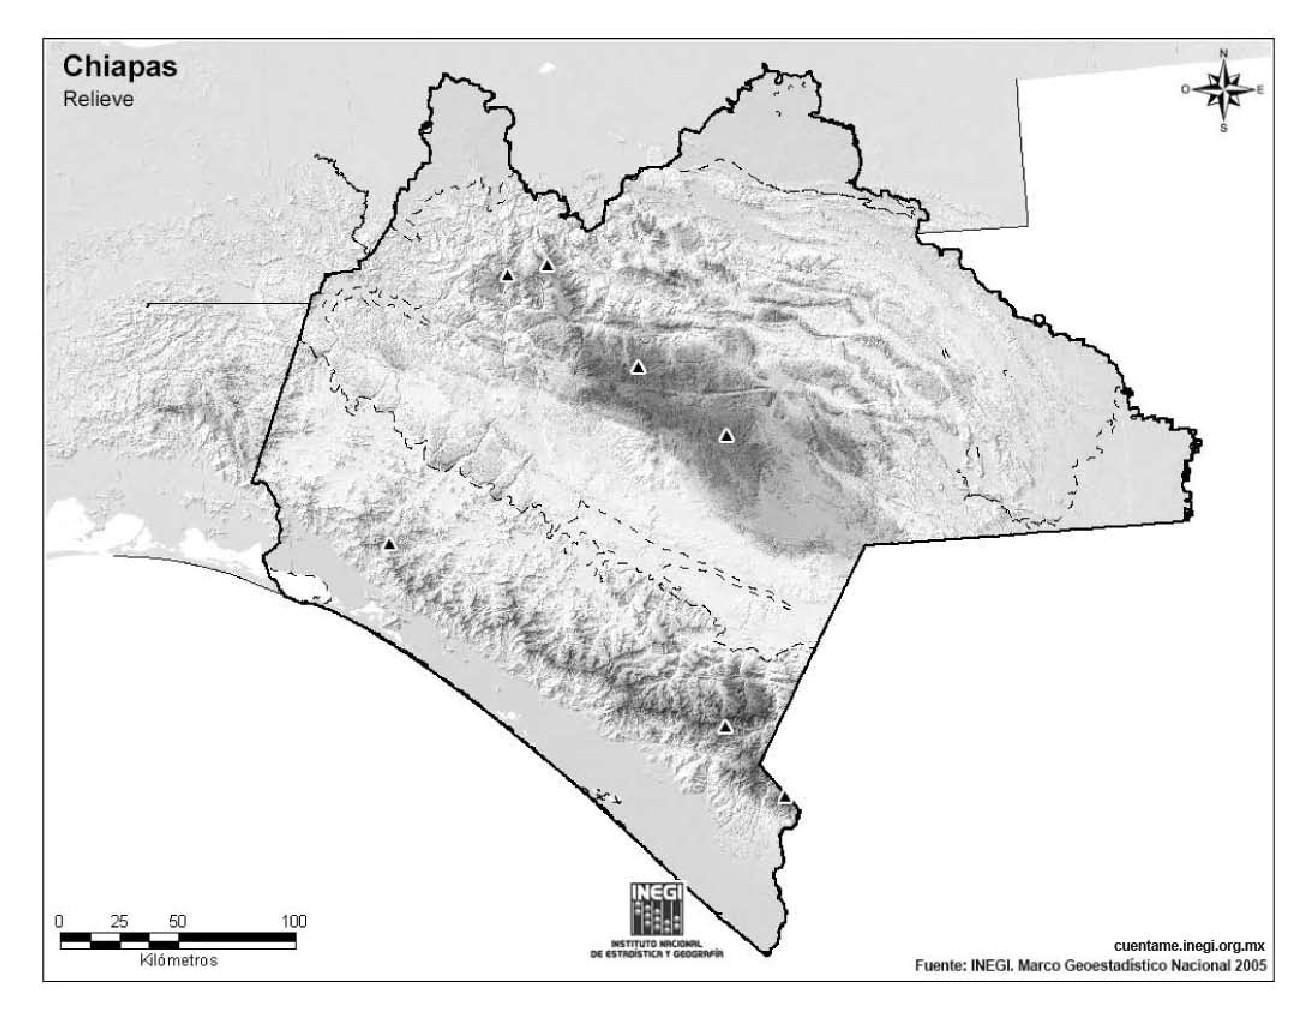 Mapa mudo de montañas de Chiapas. INEGI de México